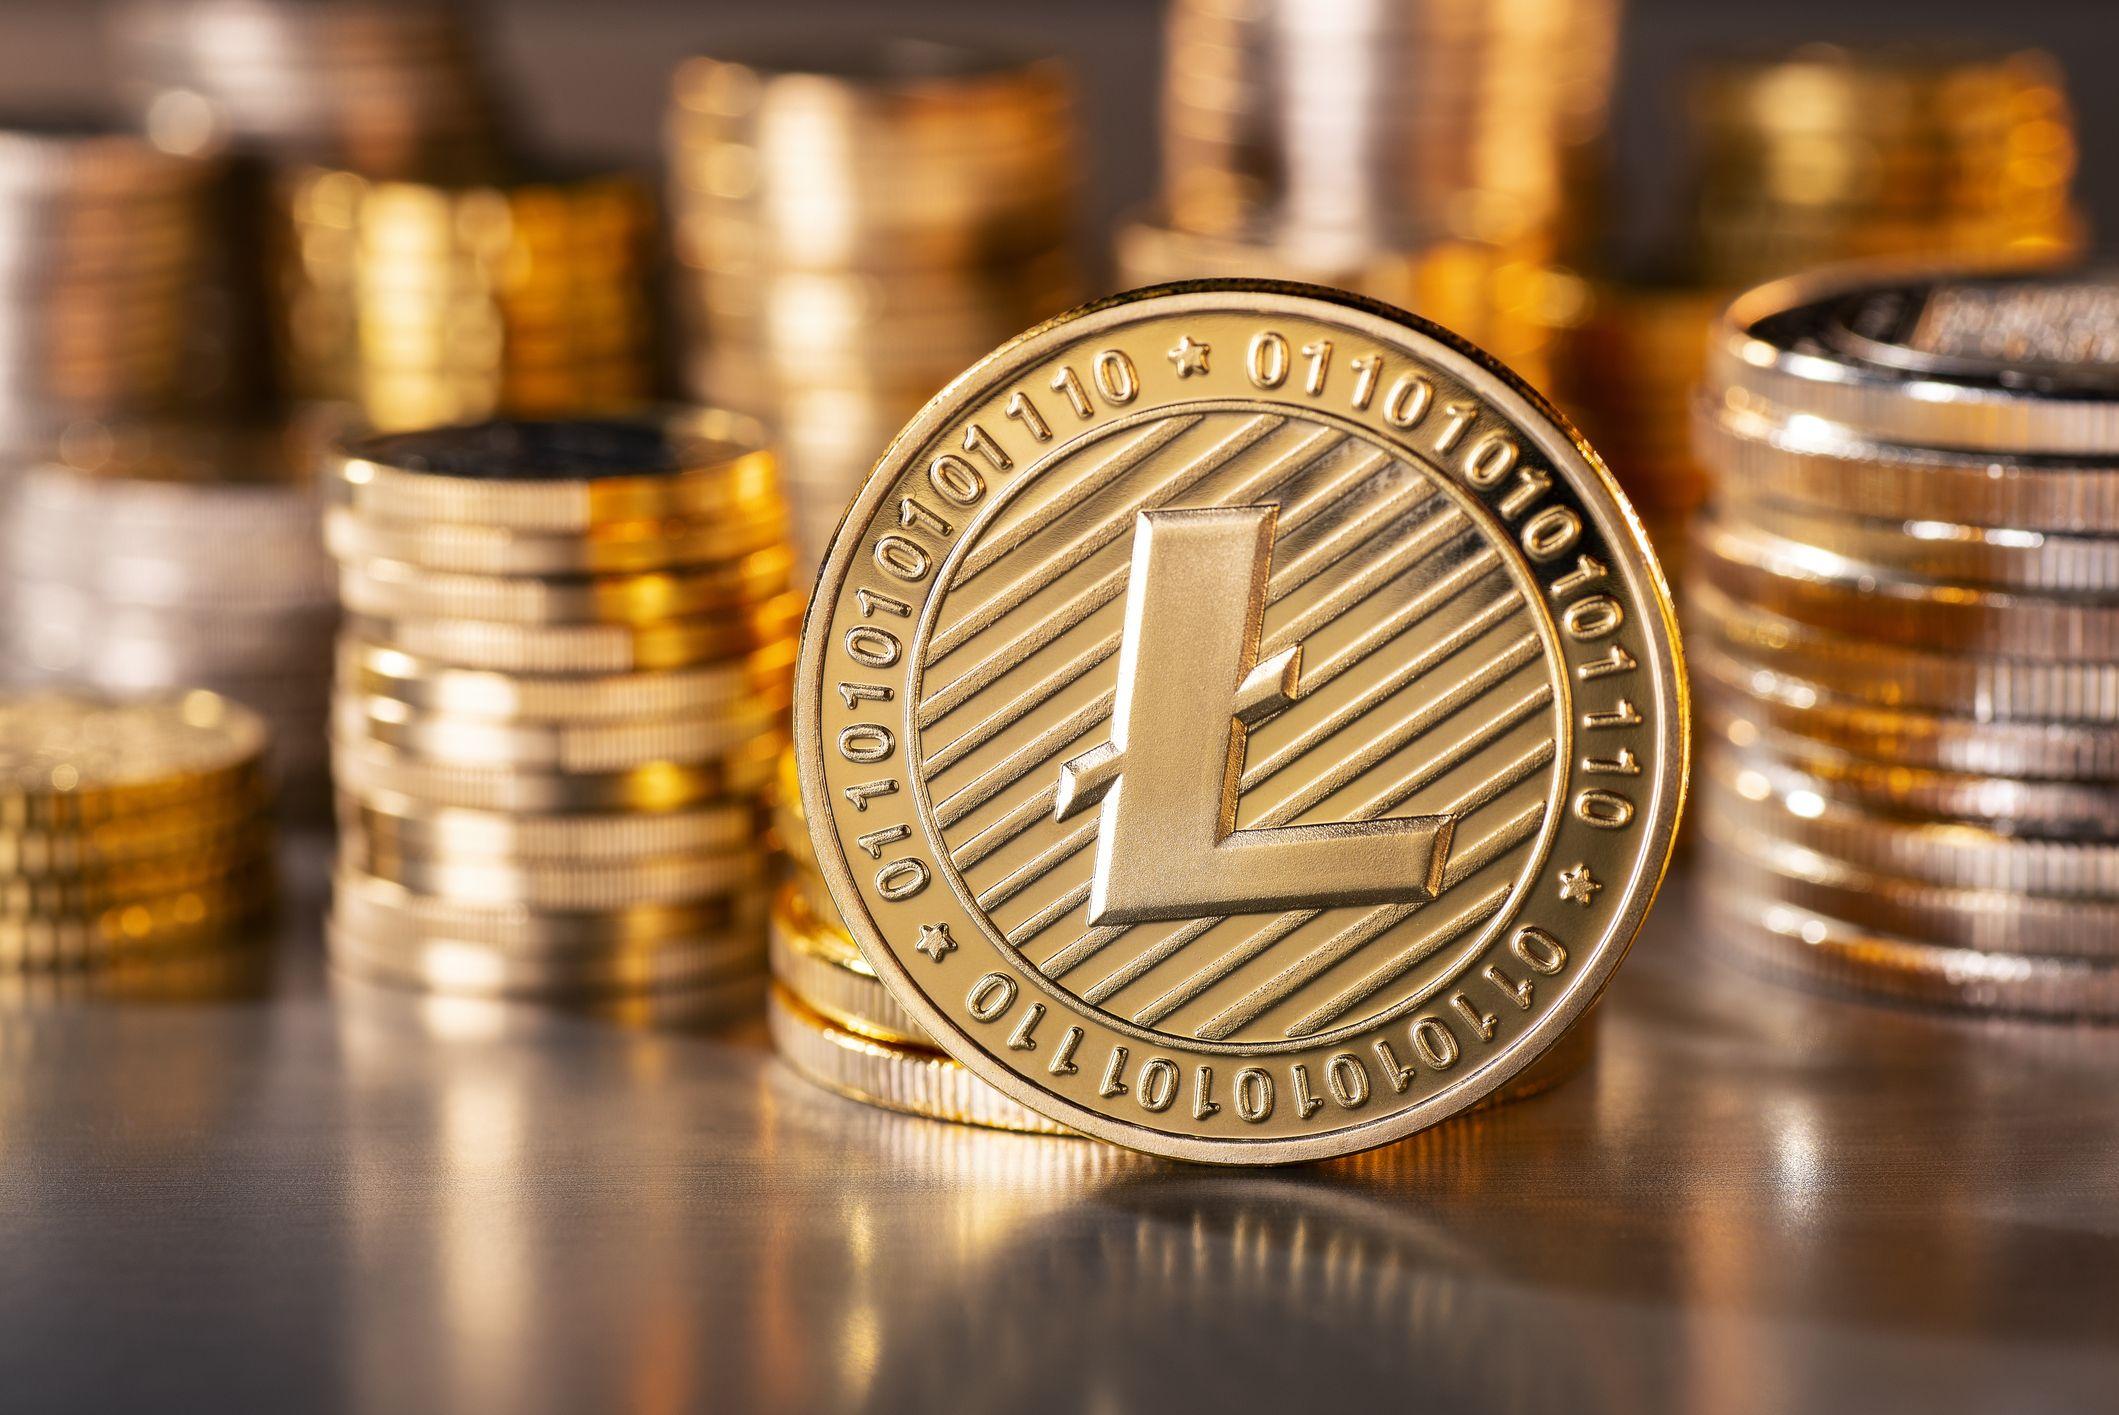 Litecoin fiyat analizi: LTC hangi seviyelere gidiyor?